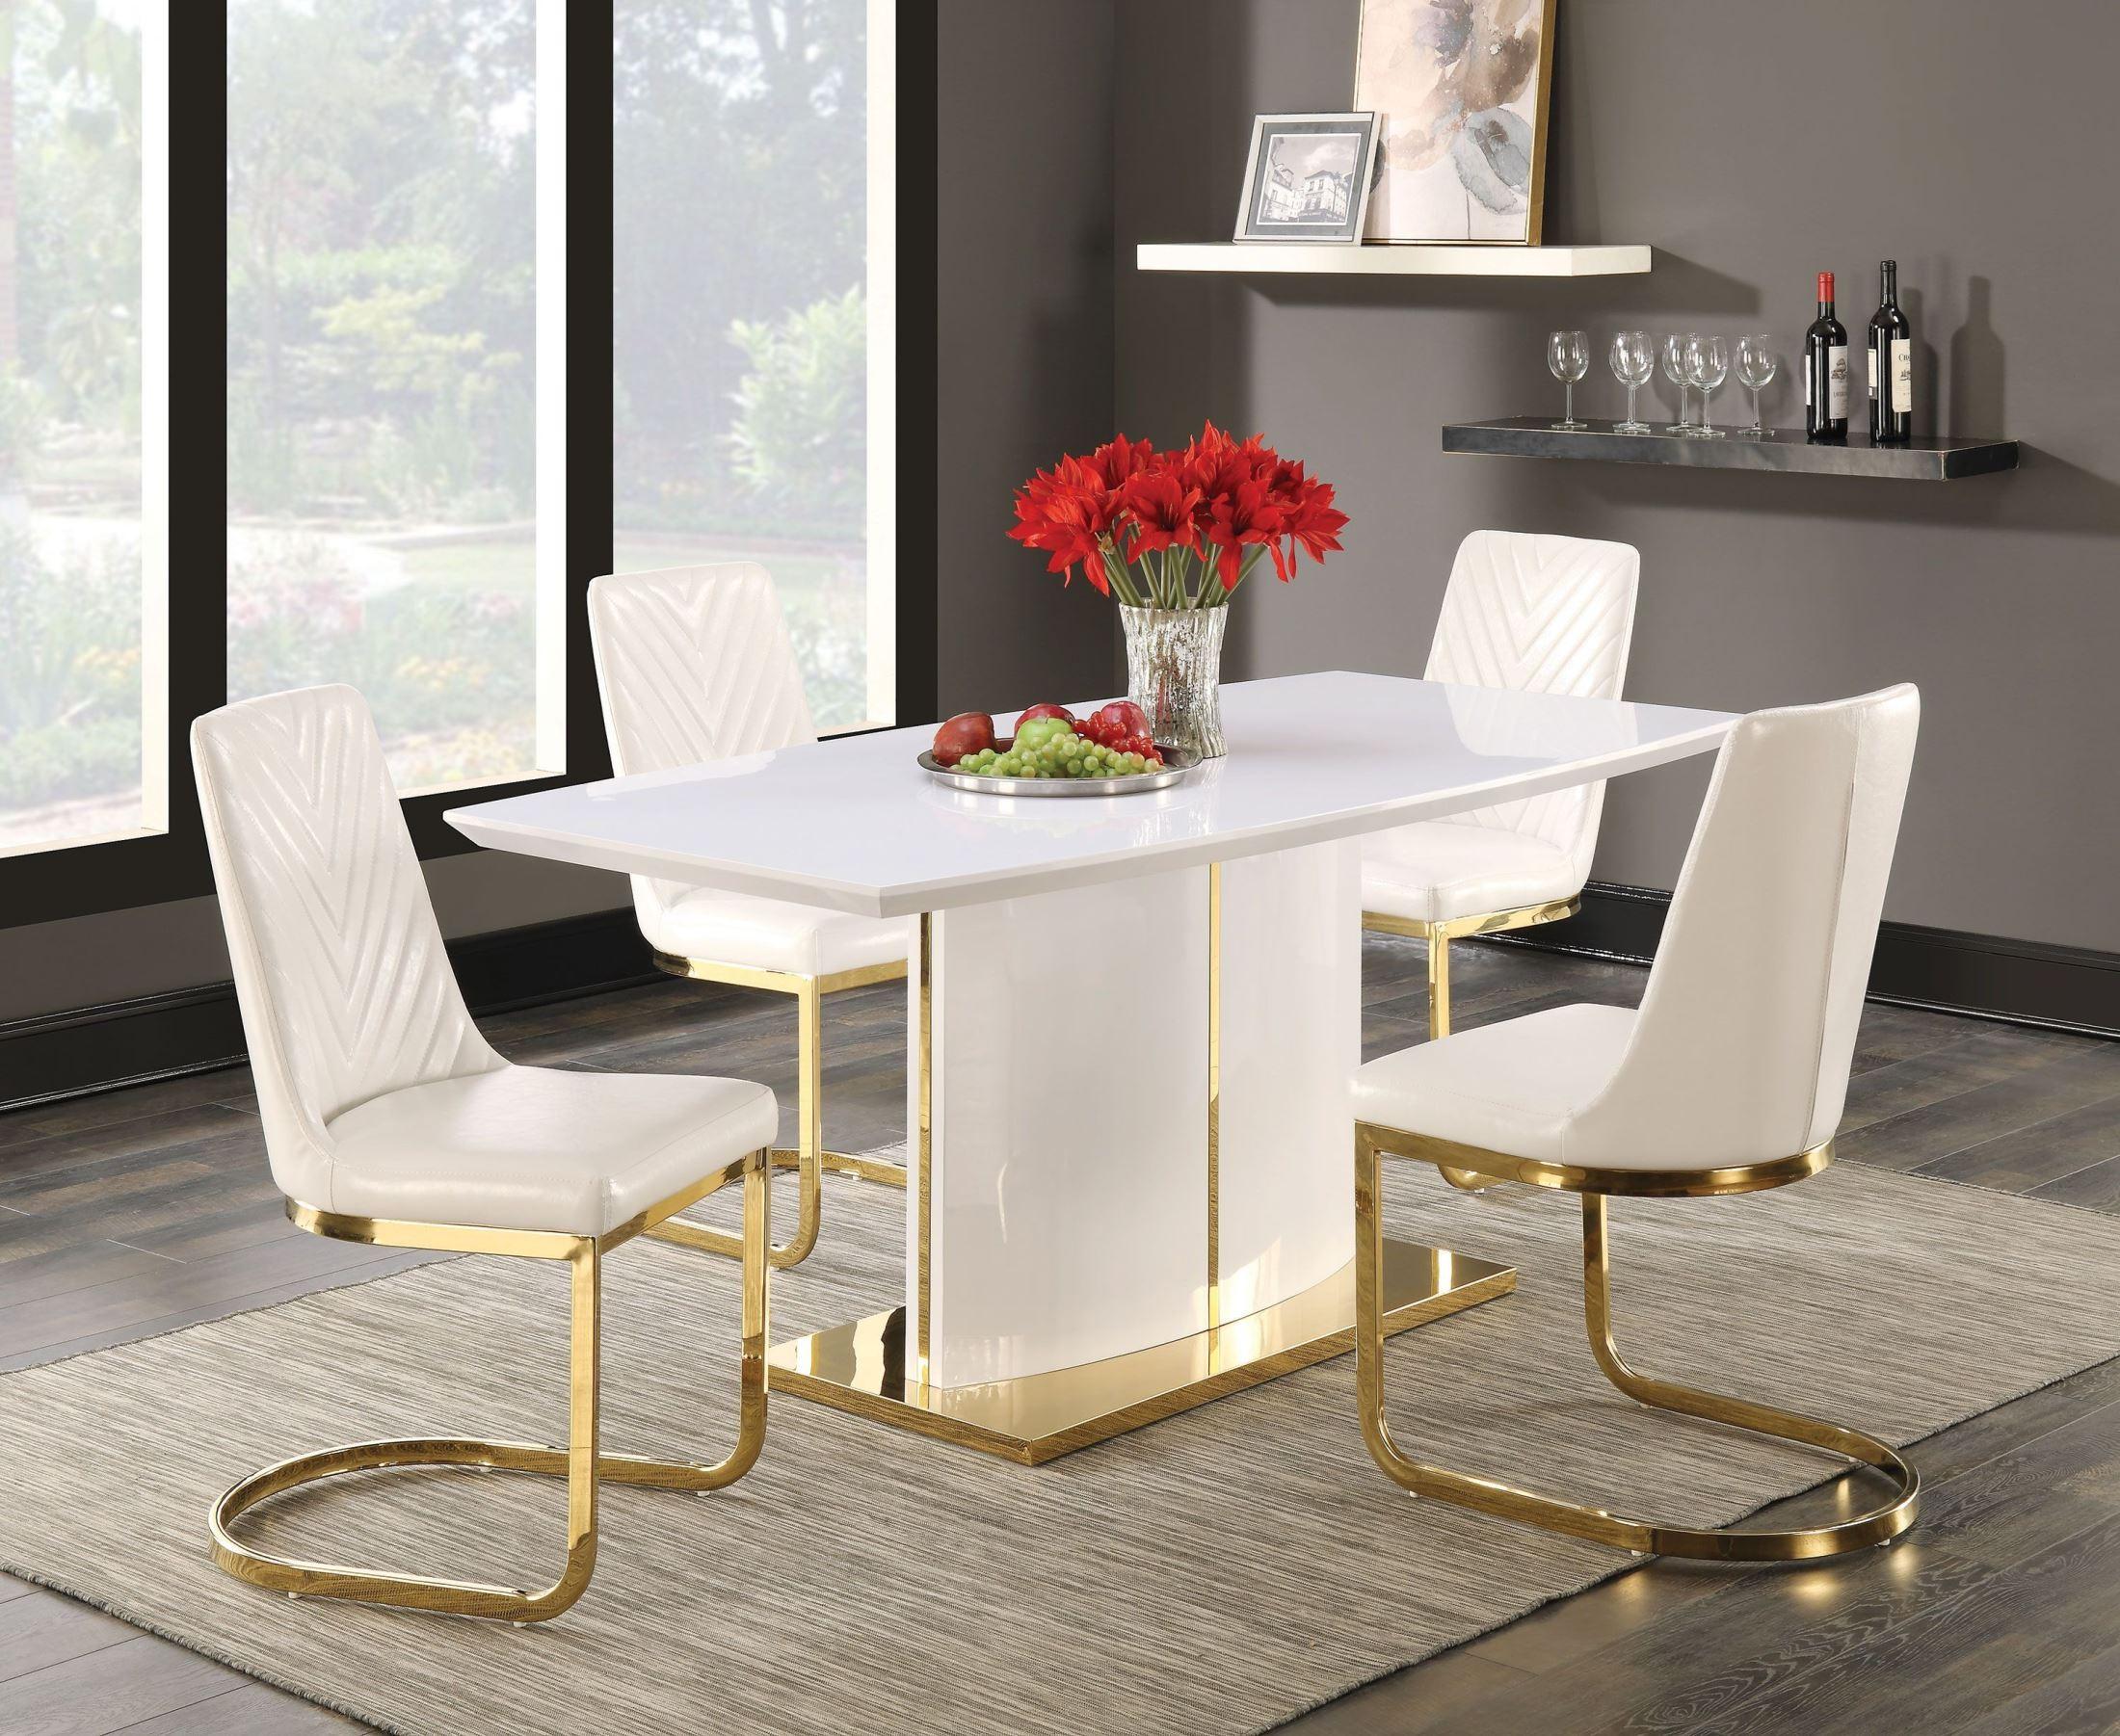 cornelia high gloss white dining room set 106711 coaster furniture. Black Bedroom Furniture Sets. Home Design Ideas